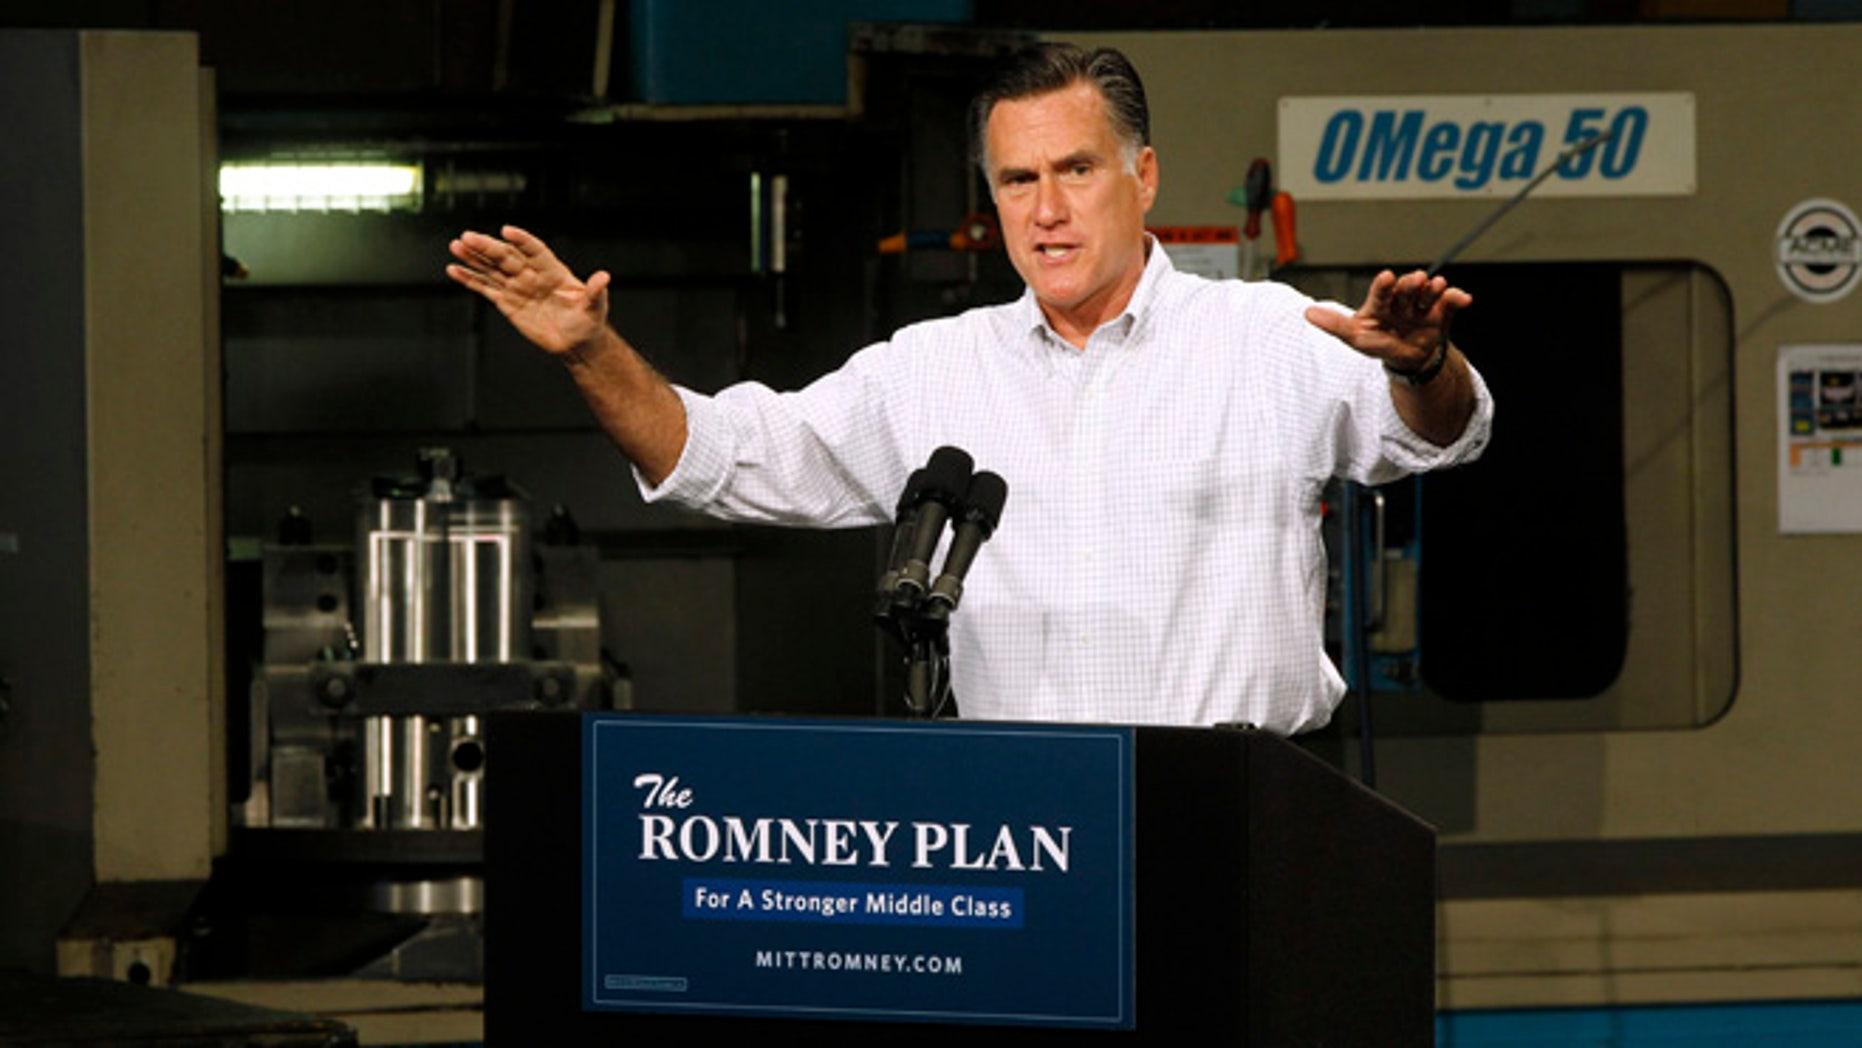 Aug. 7, 2012: Mitt Romney campaigns in Elk Grove Village, Ill.